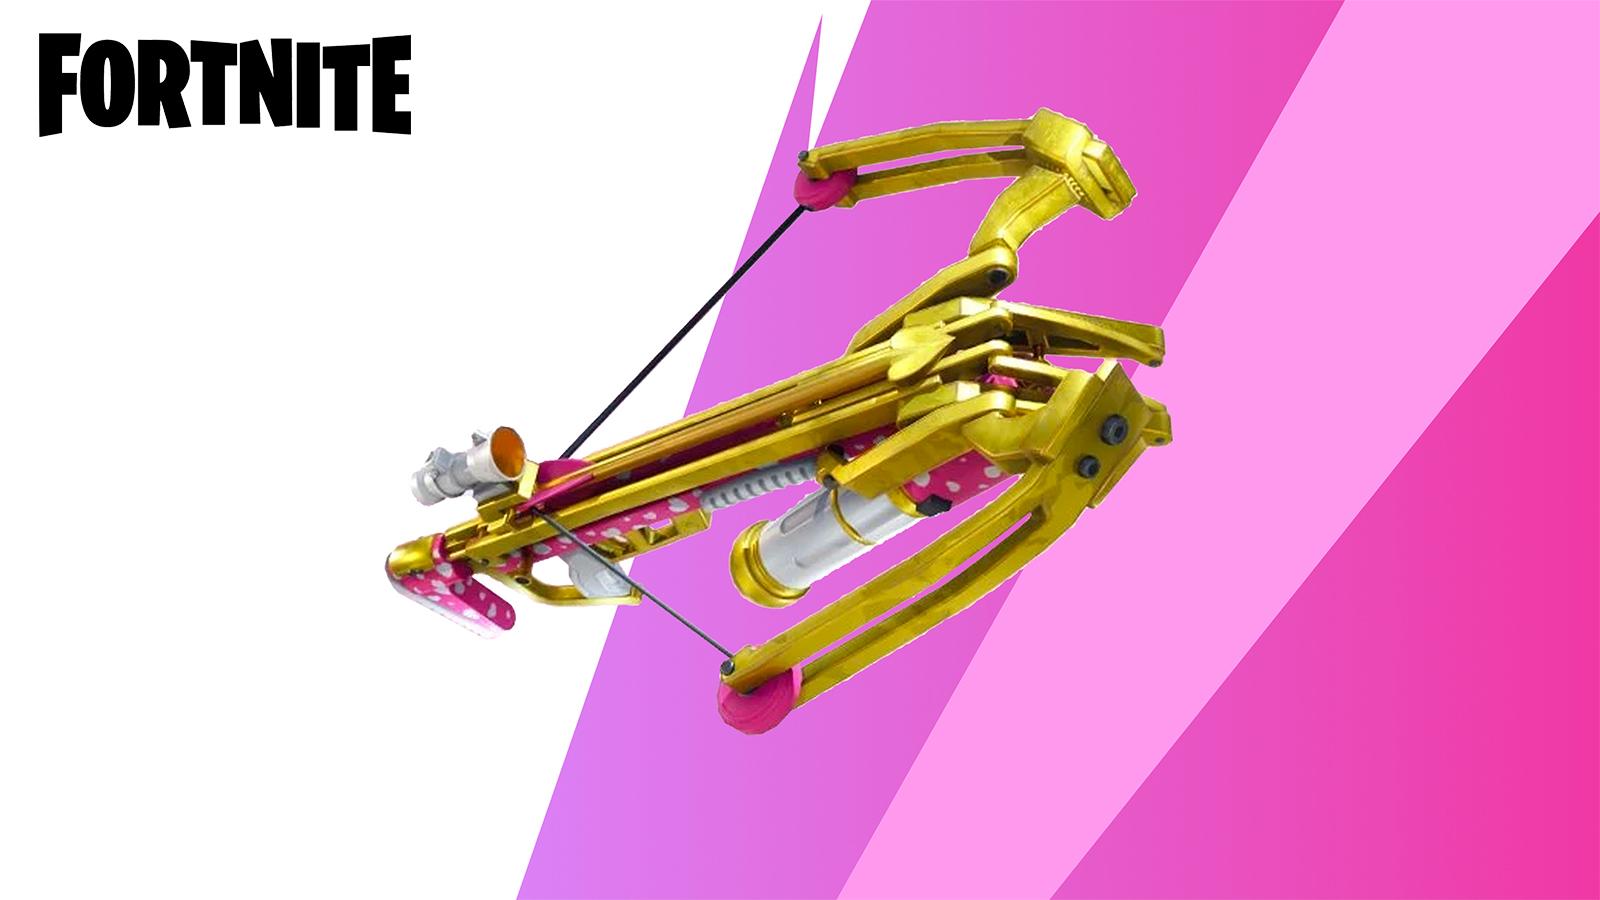 Fortnite Cupid's Crossbow